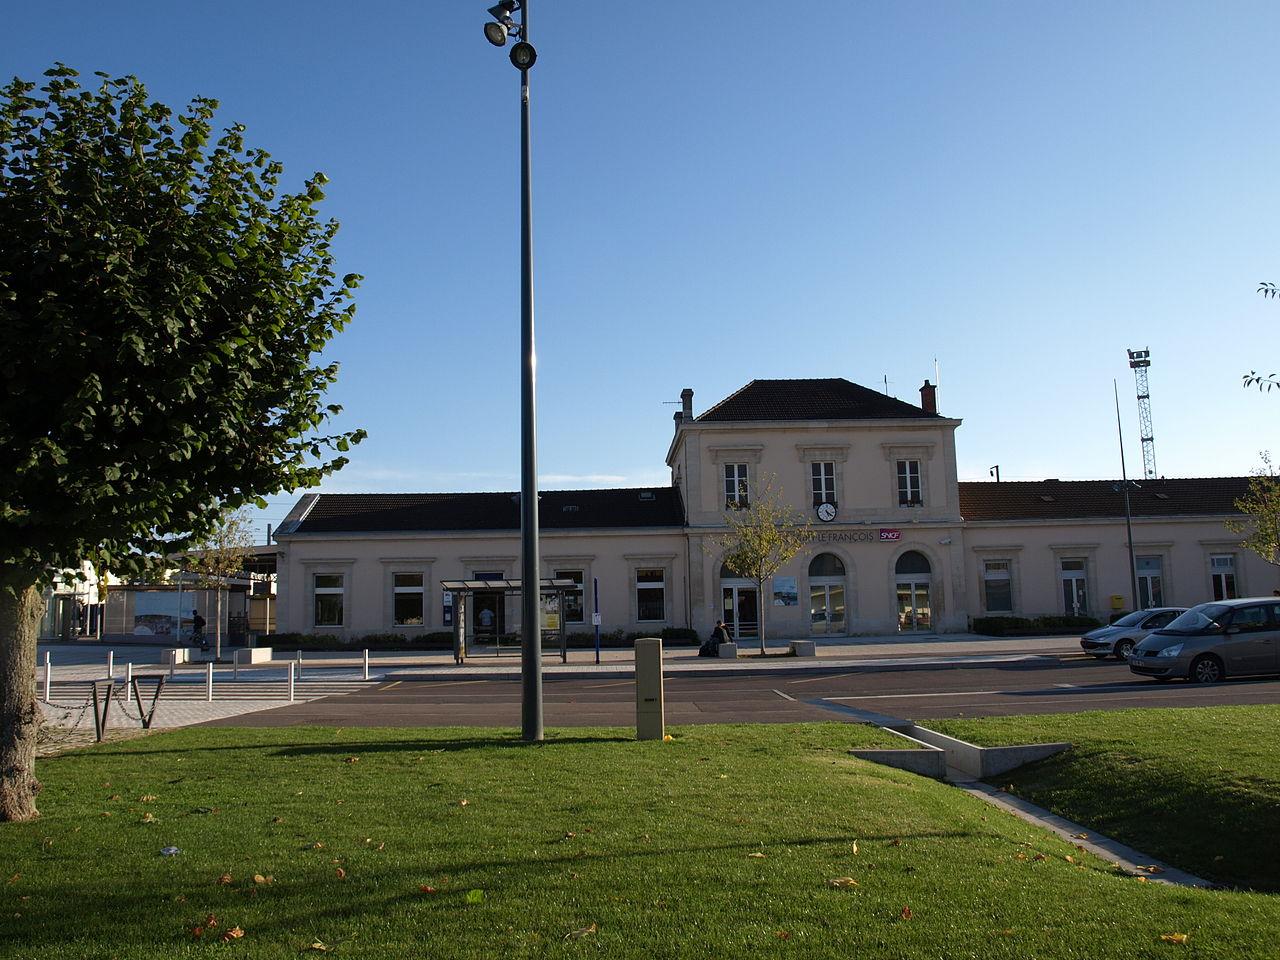 Vitry-le-Francois-train-station